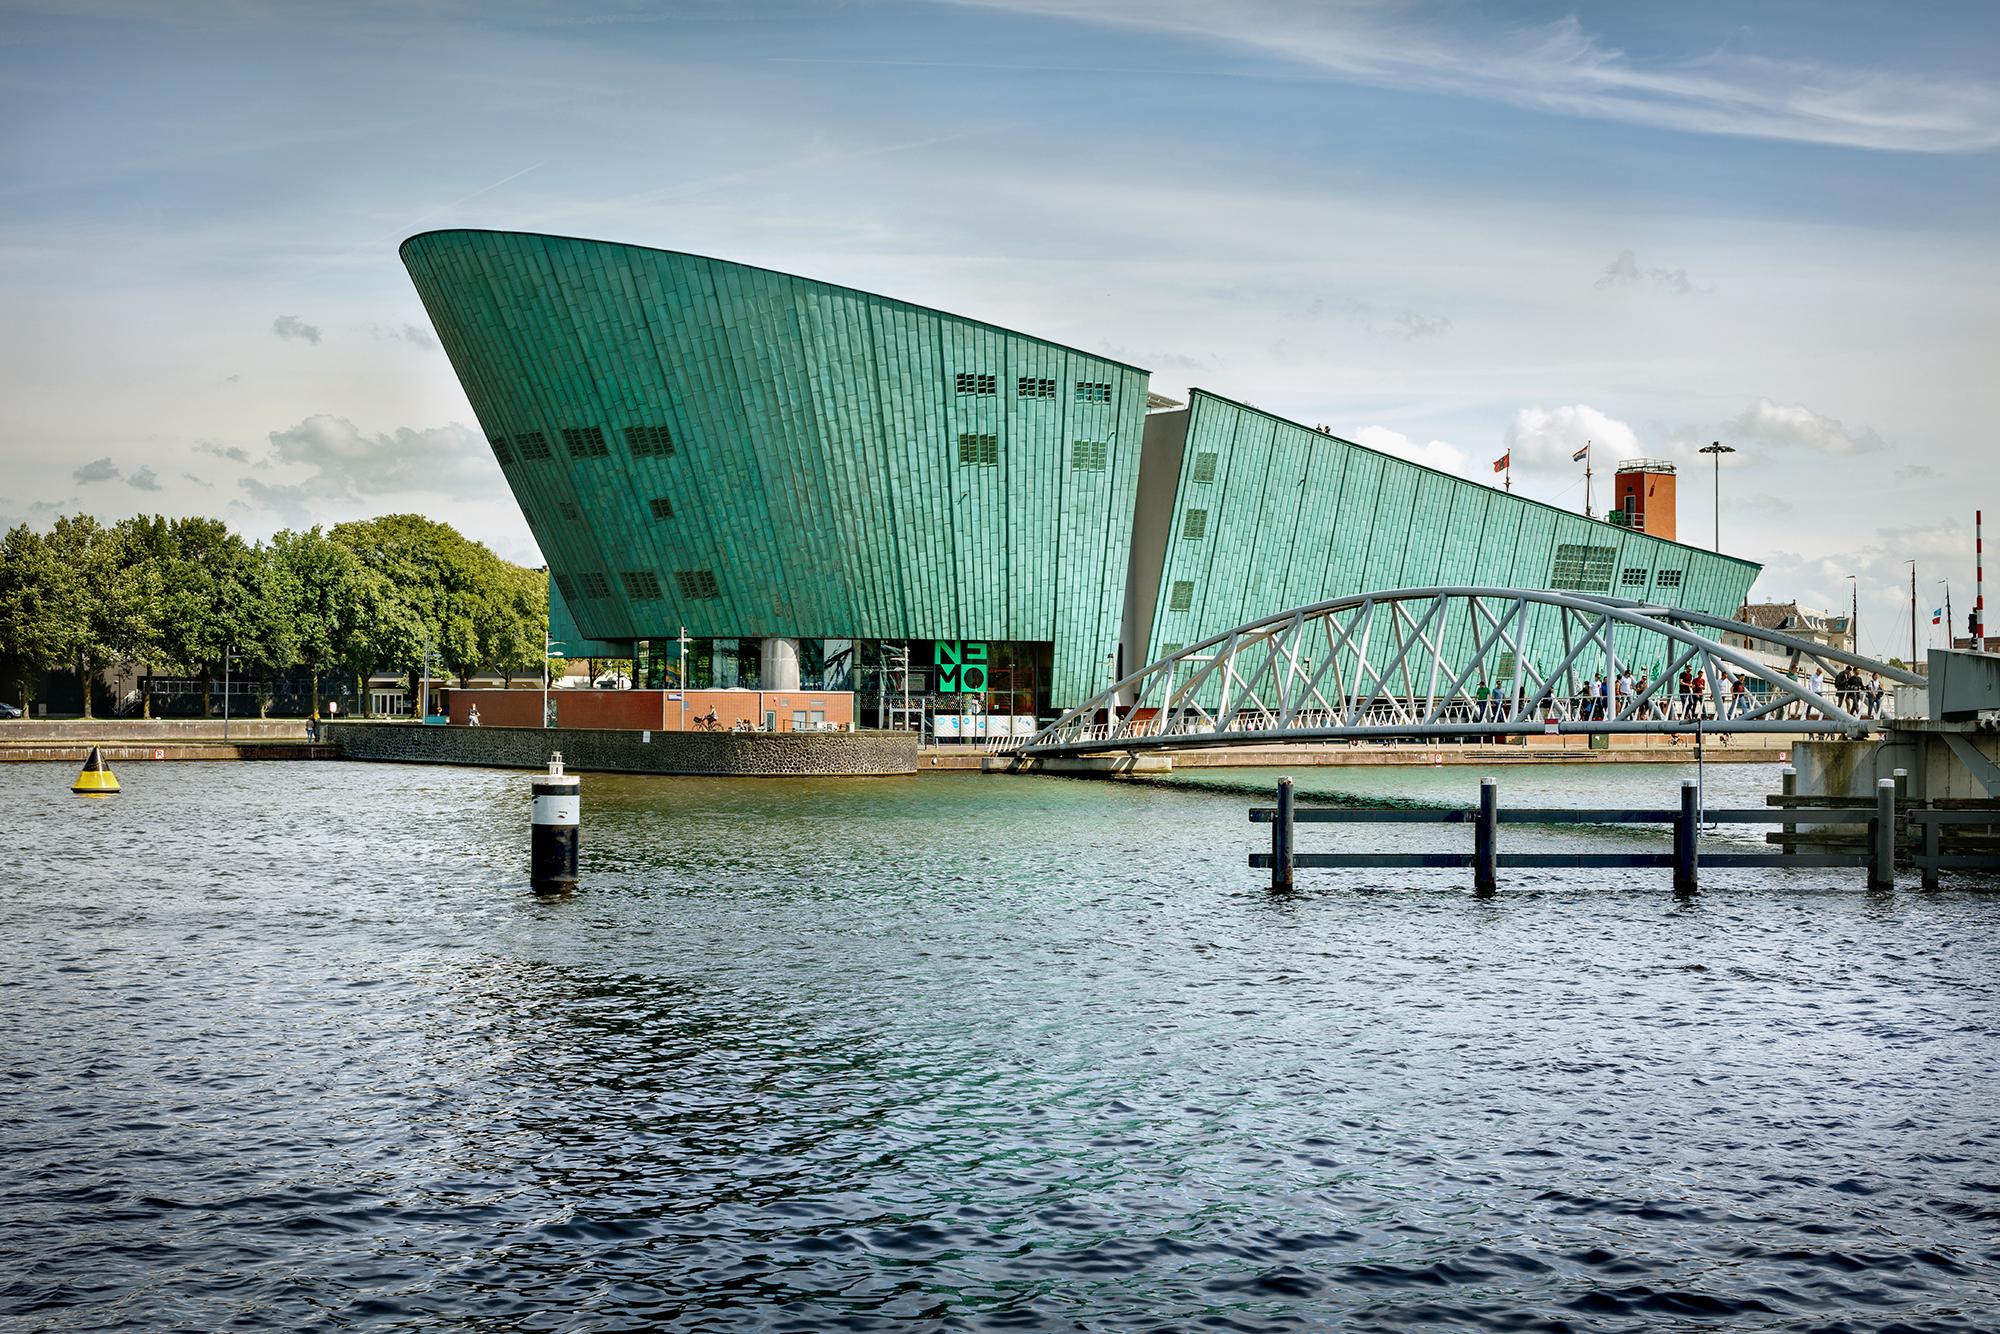 музеи Амстердама Видеть больше: Лучшие музеи Амстердама 12